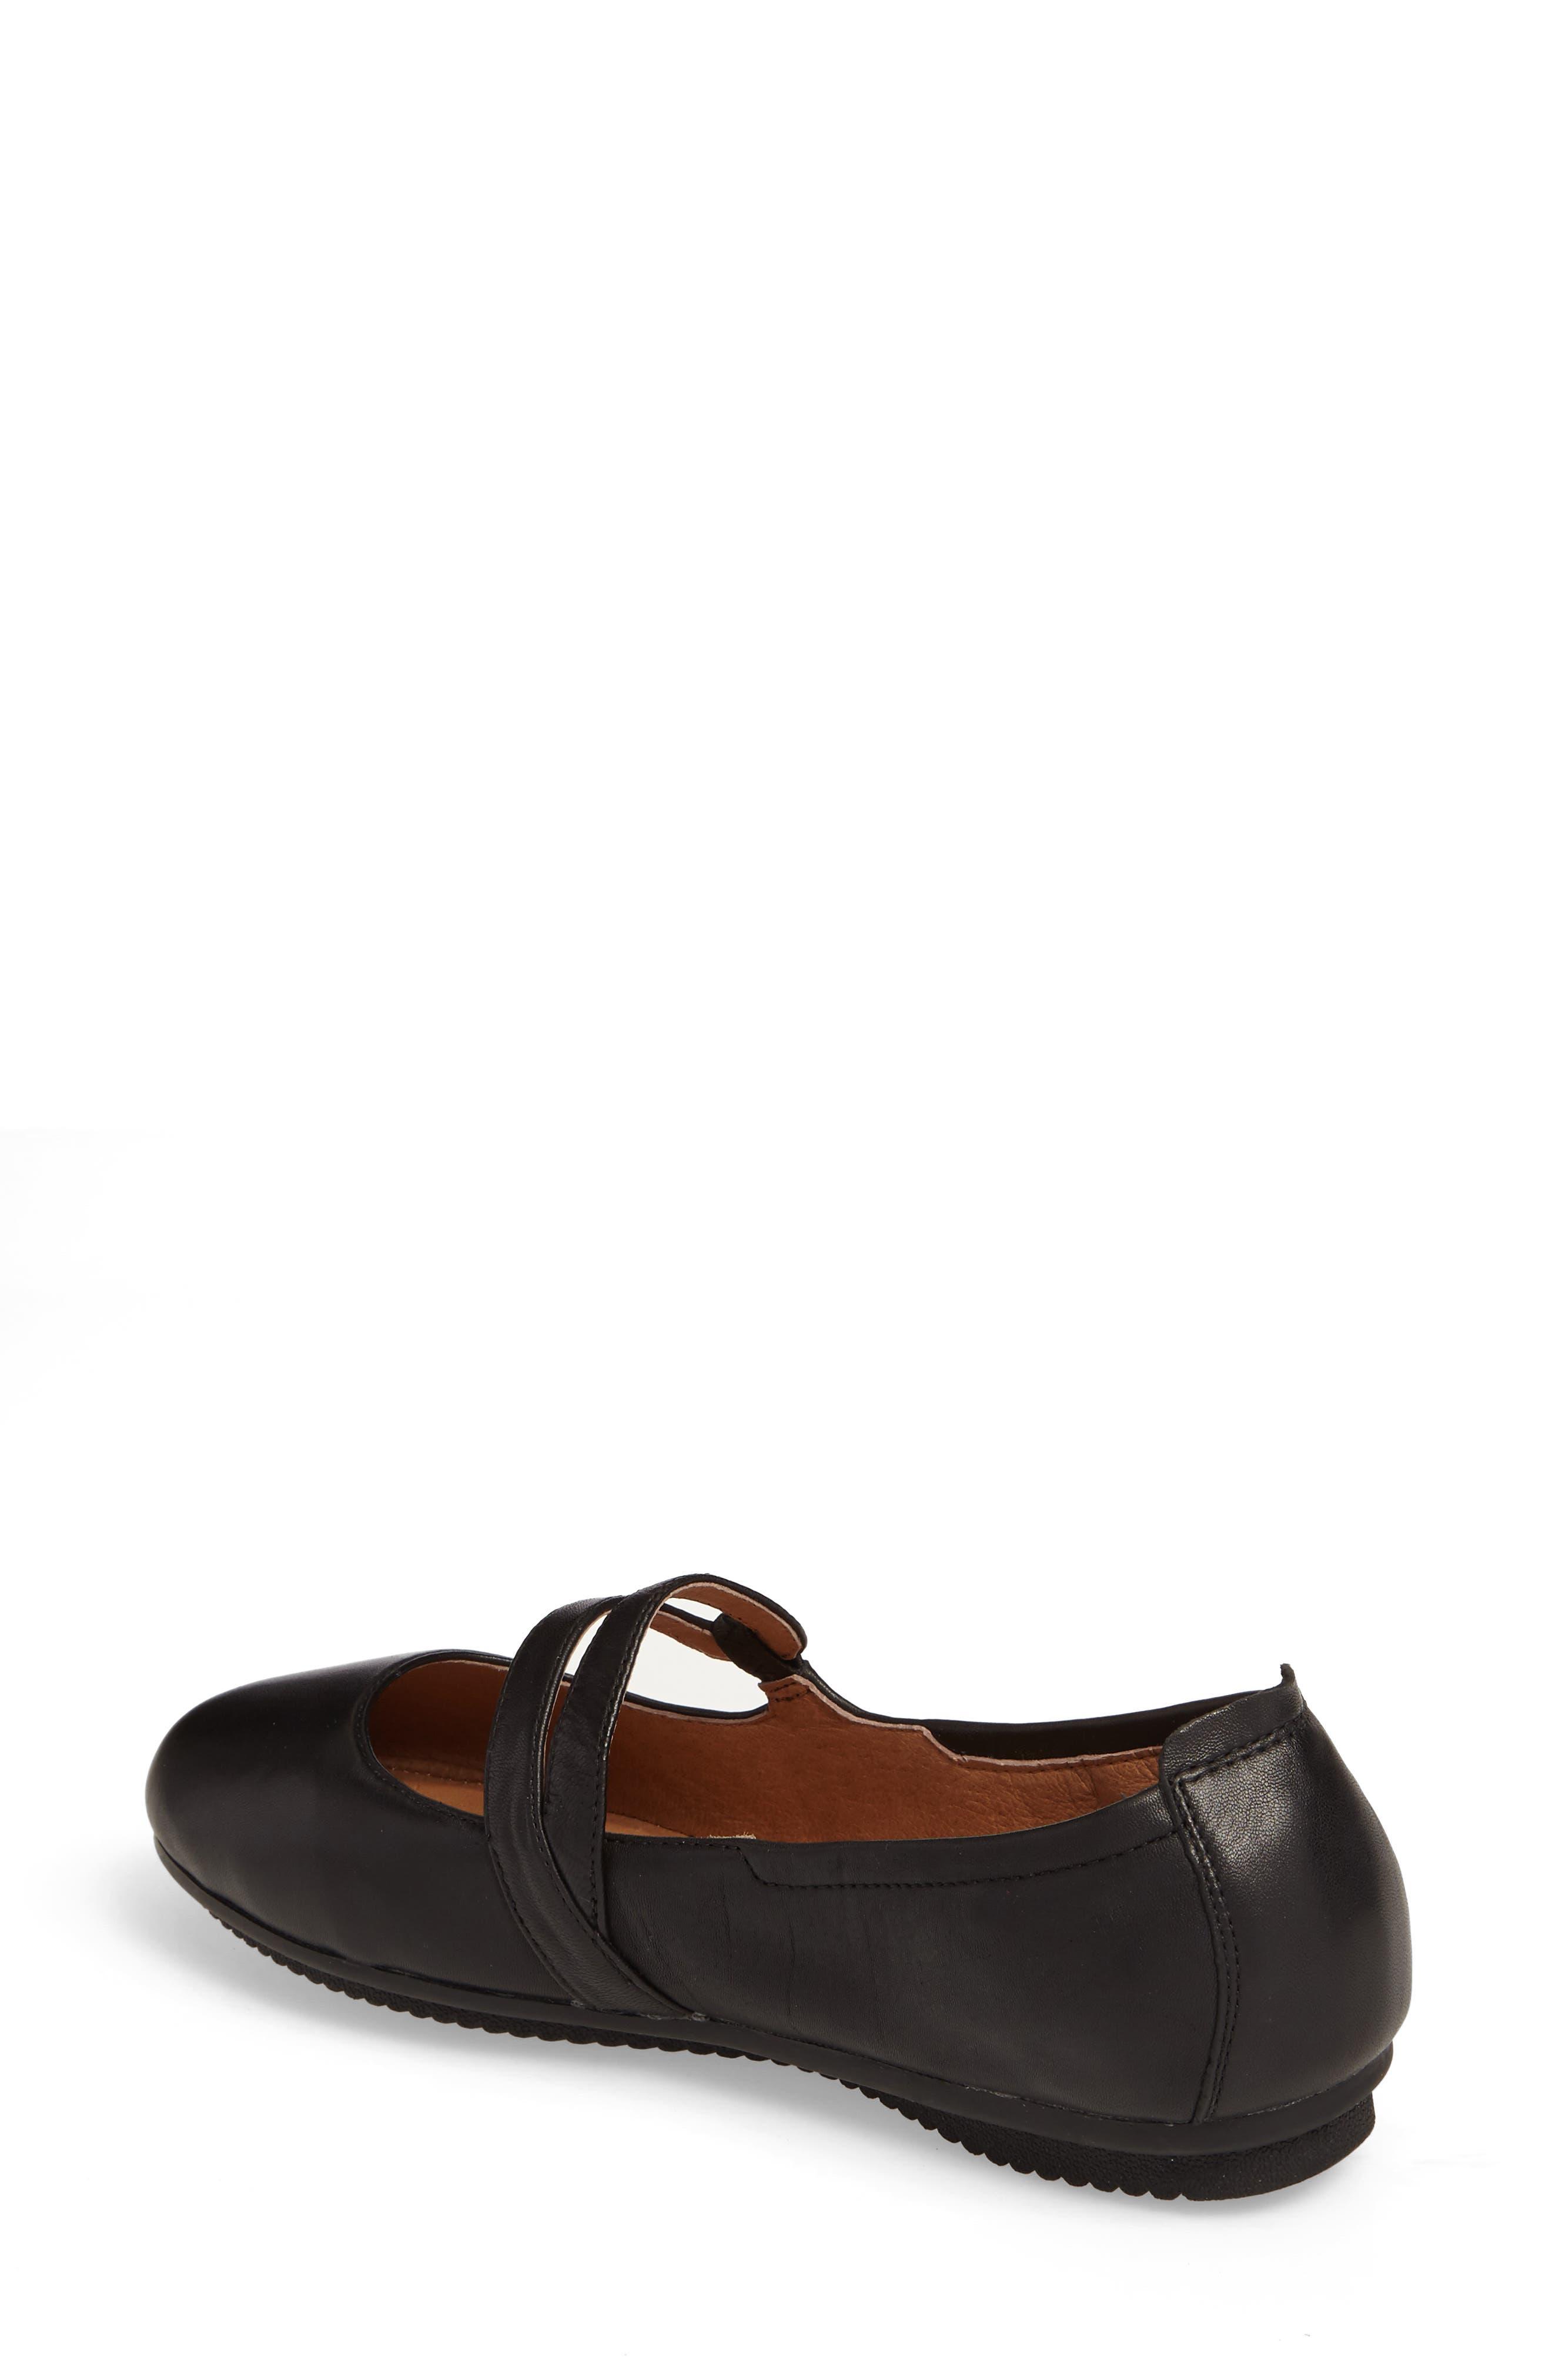 Pippa 63 Flat,                             Alternate thumbnail 2, color,                             Black Leather